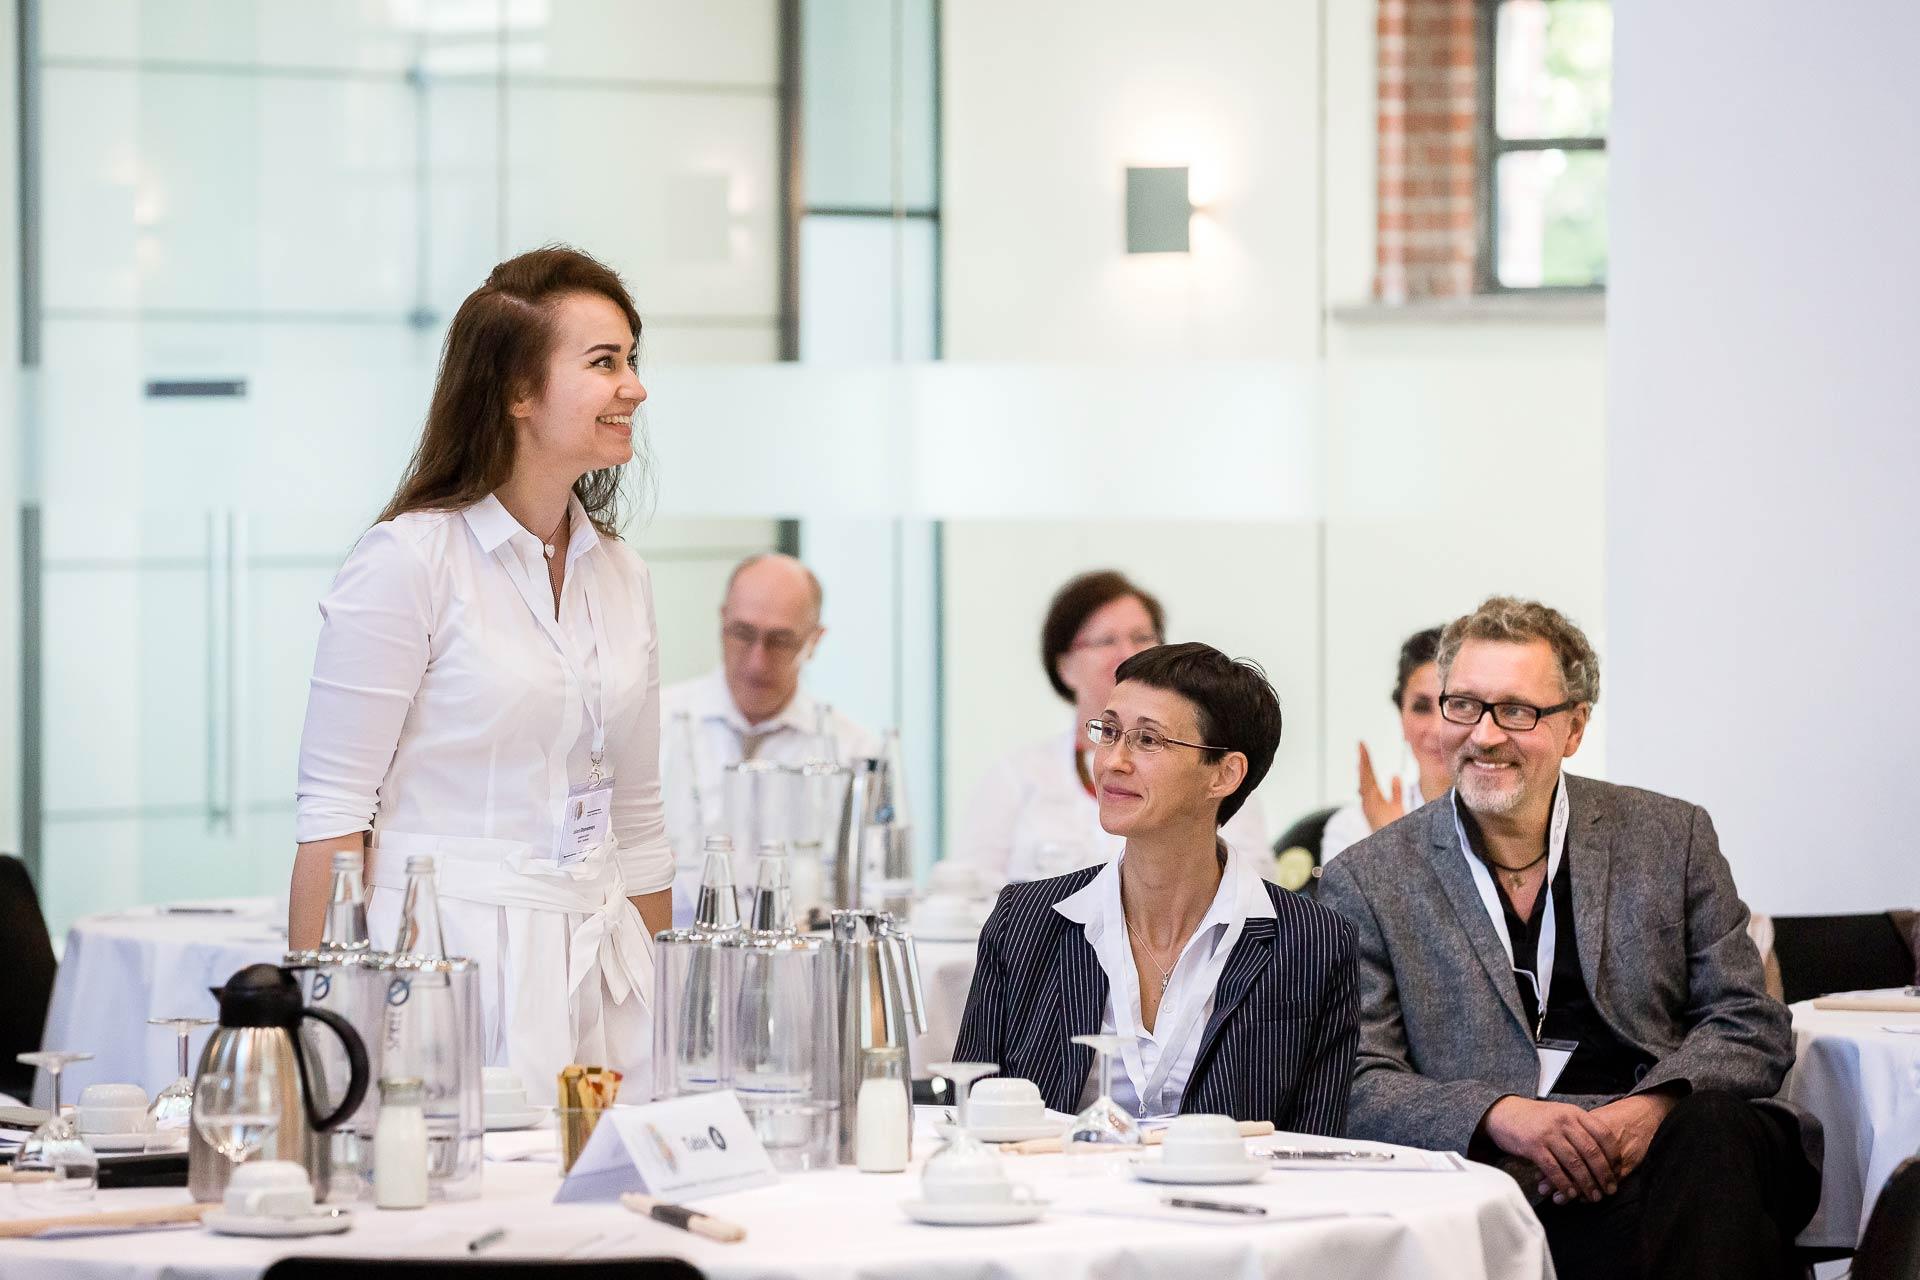 eventfotos-symposium-umweltforum-berlin-academus